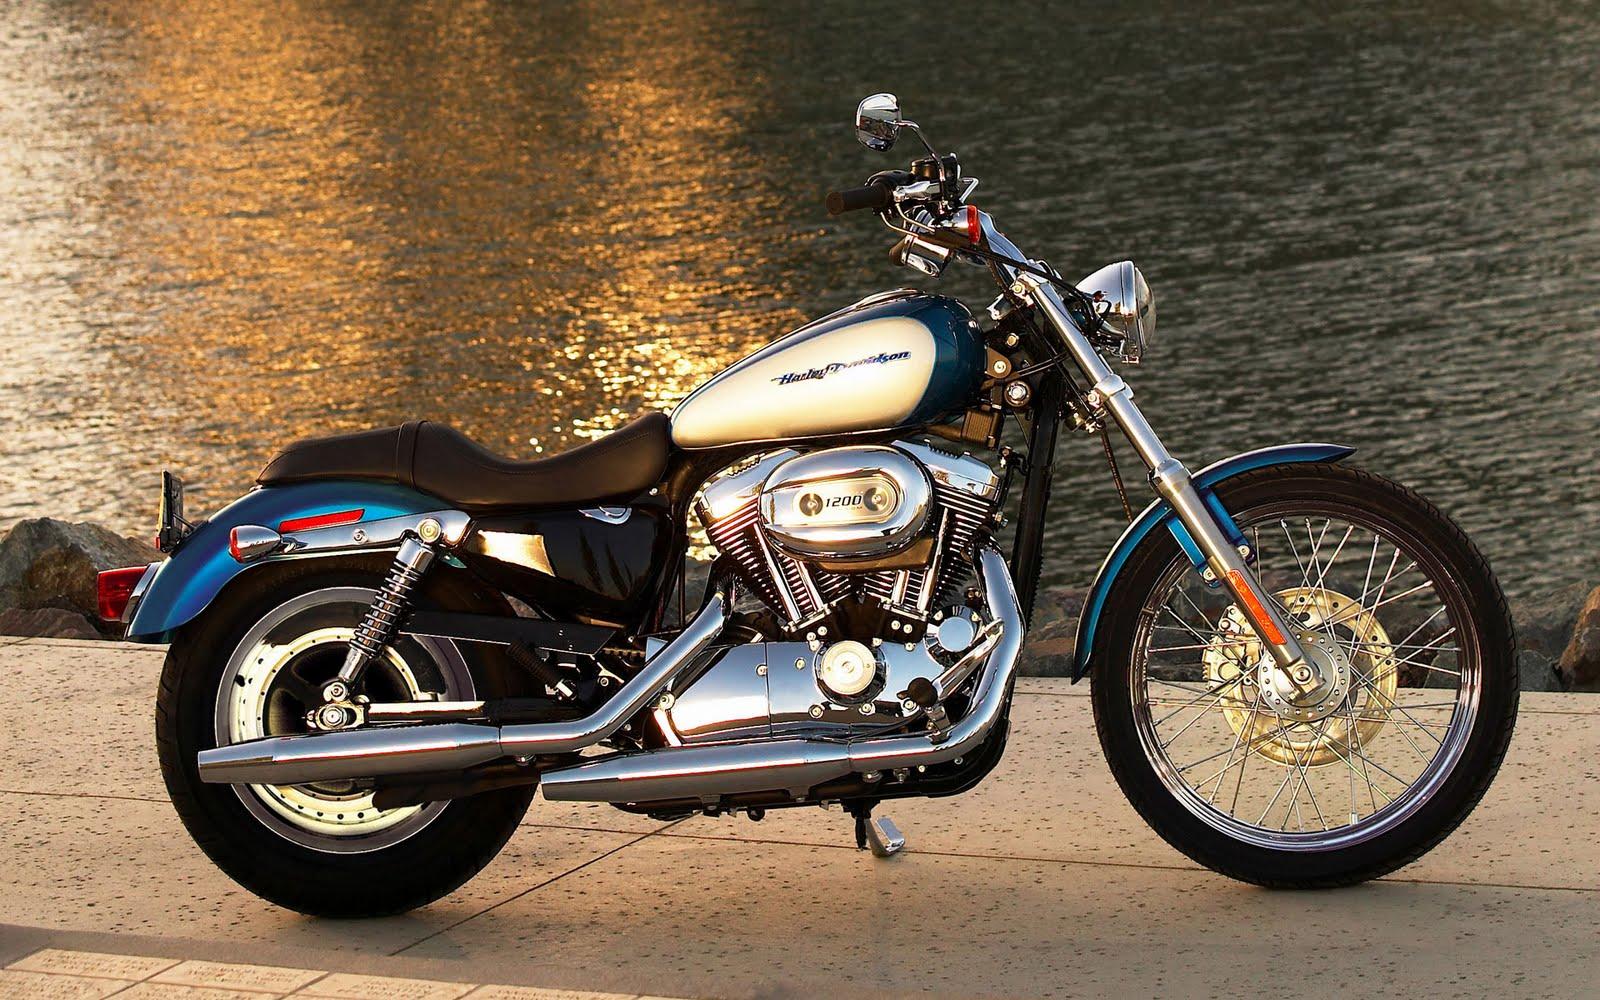 Harley Davidson Wallpapers Hd Best Bikes Pictures By Atit: Harley Davidson Wallpaper